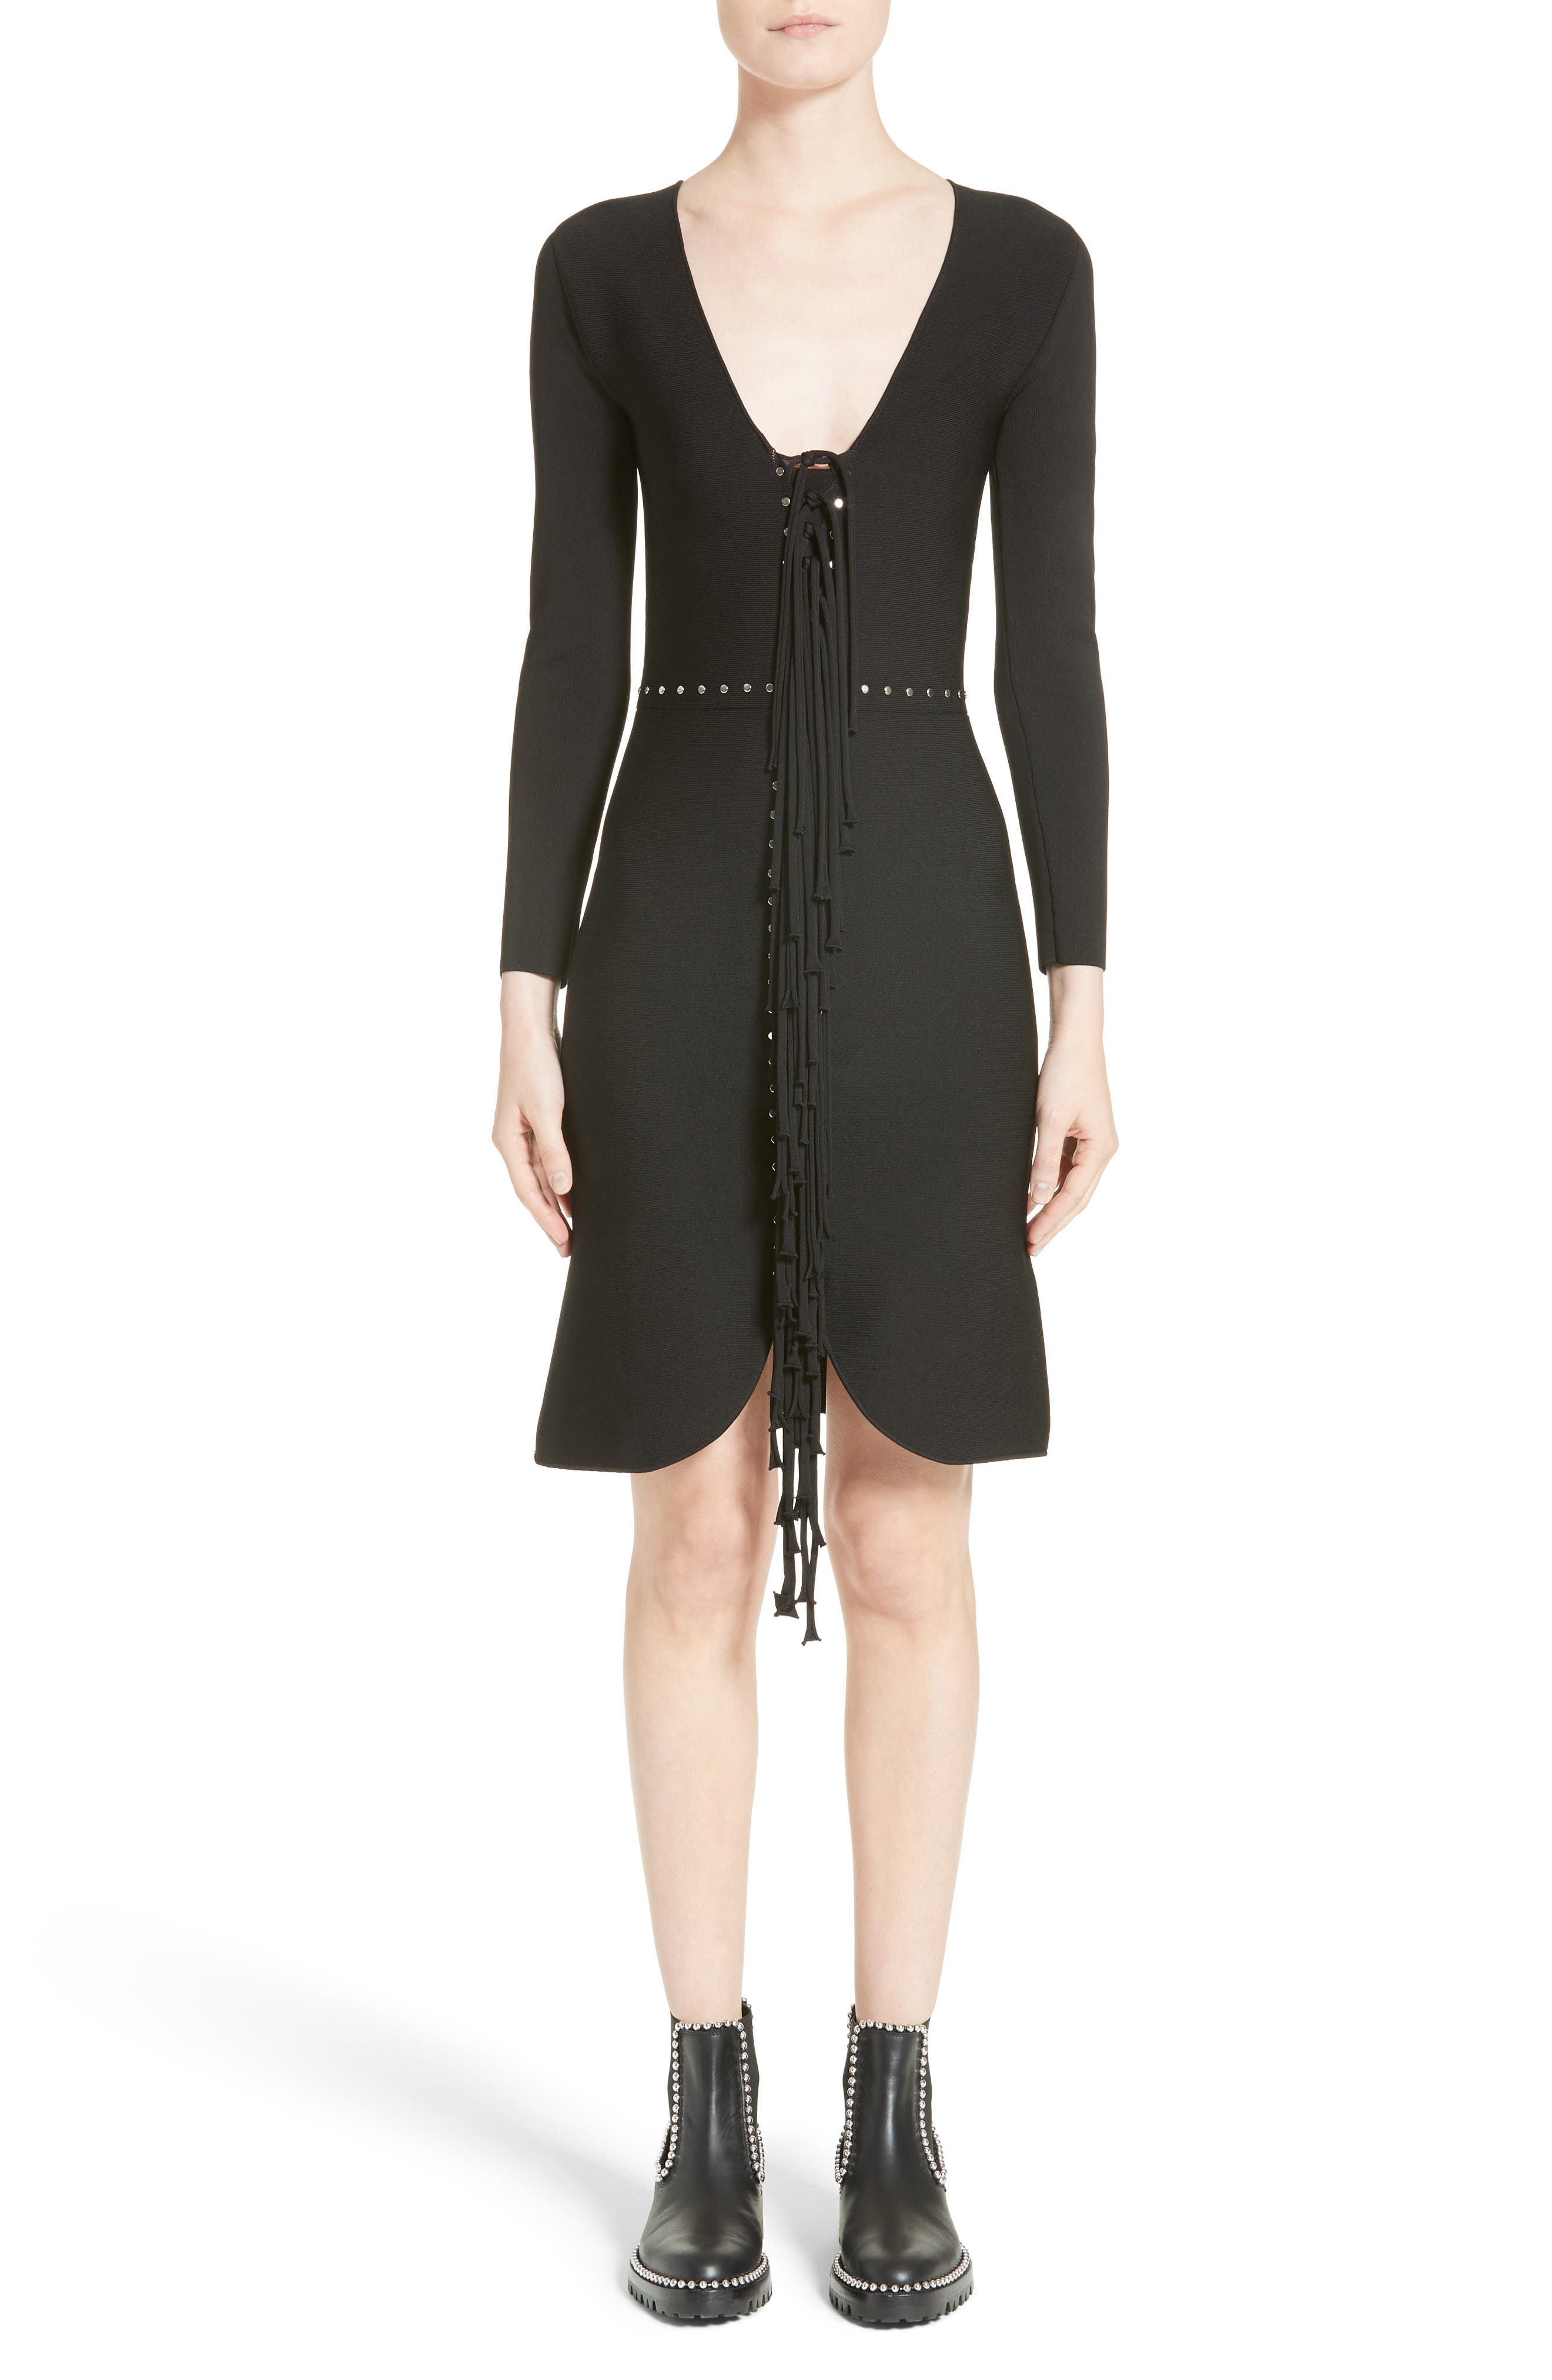 Alternate Image 1 Selected - Alexander Wang Knotted Fringe Knit Dress